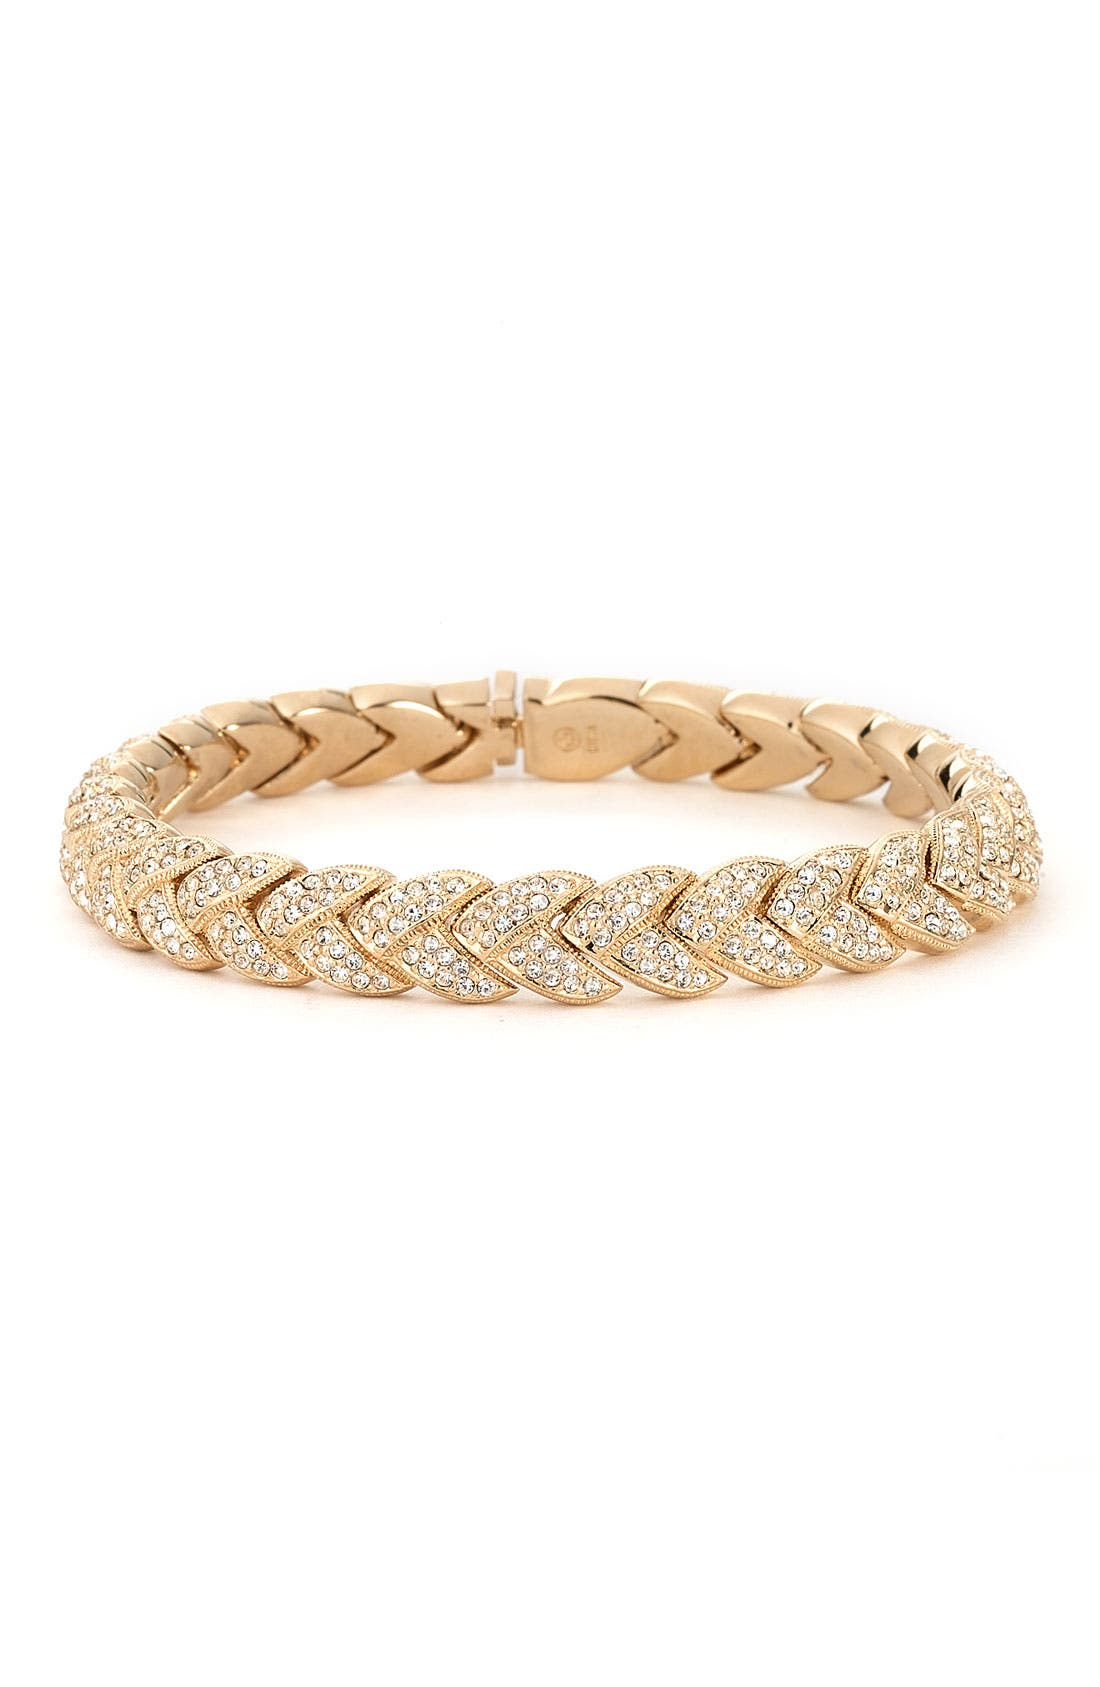 Alternate Image 1 Selected - Nadri Woven Pavé Crystal Bracelet